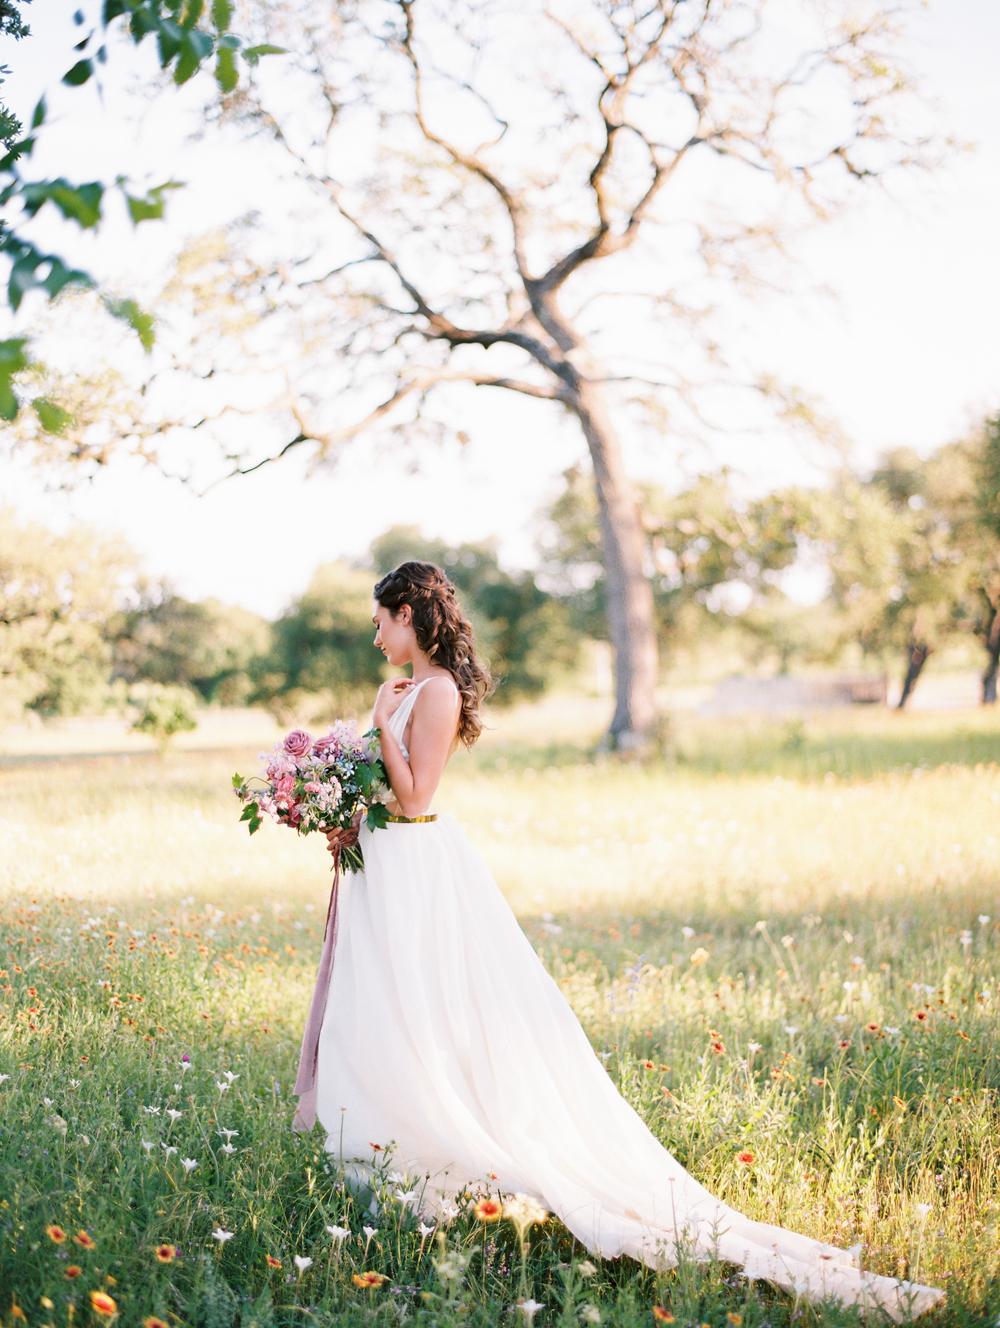 kristin-la-voie-photography-Austin-Wedding-Photographer-20 (1).jpg